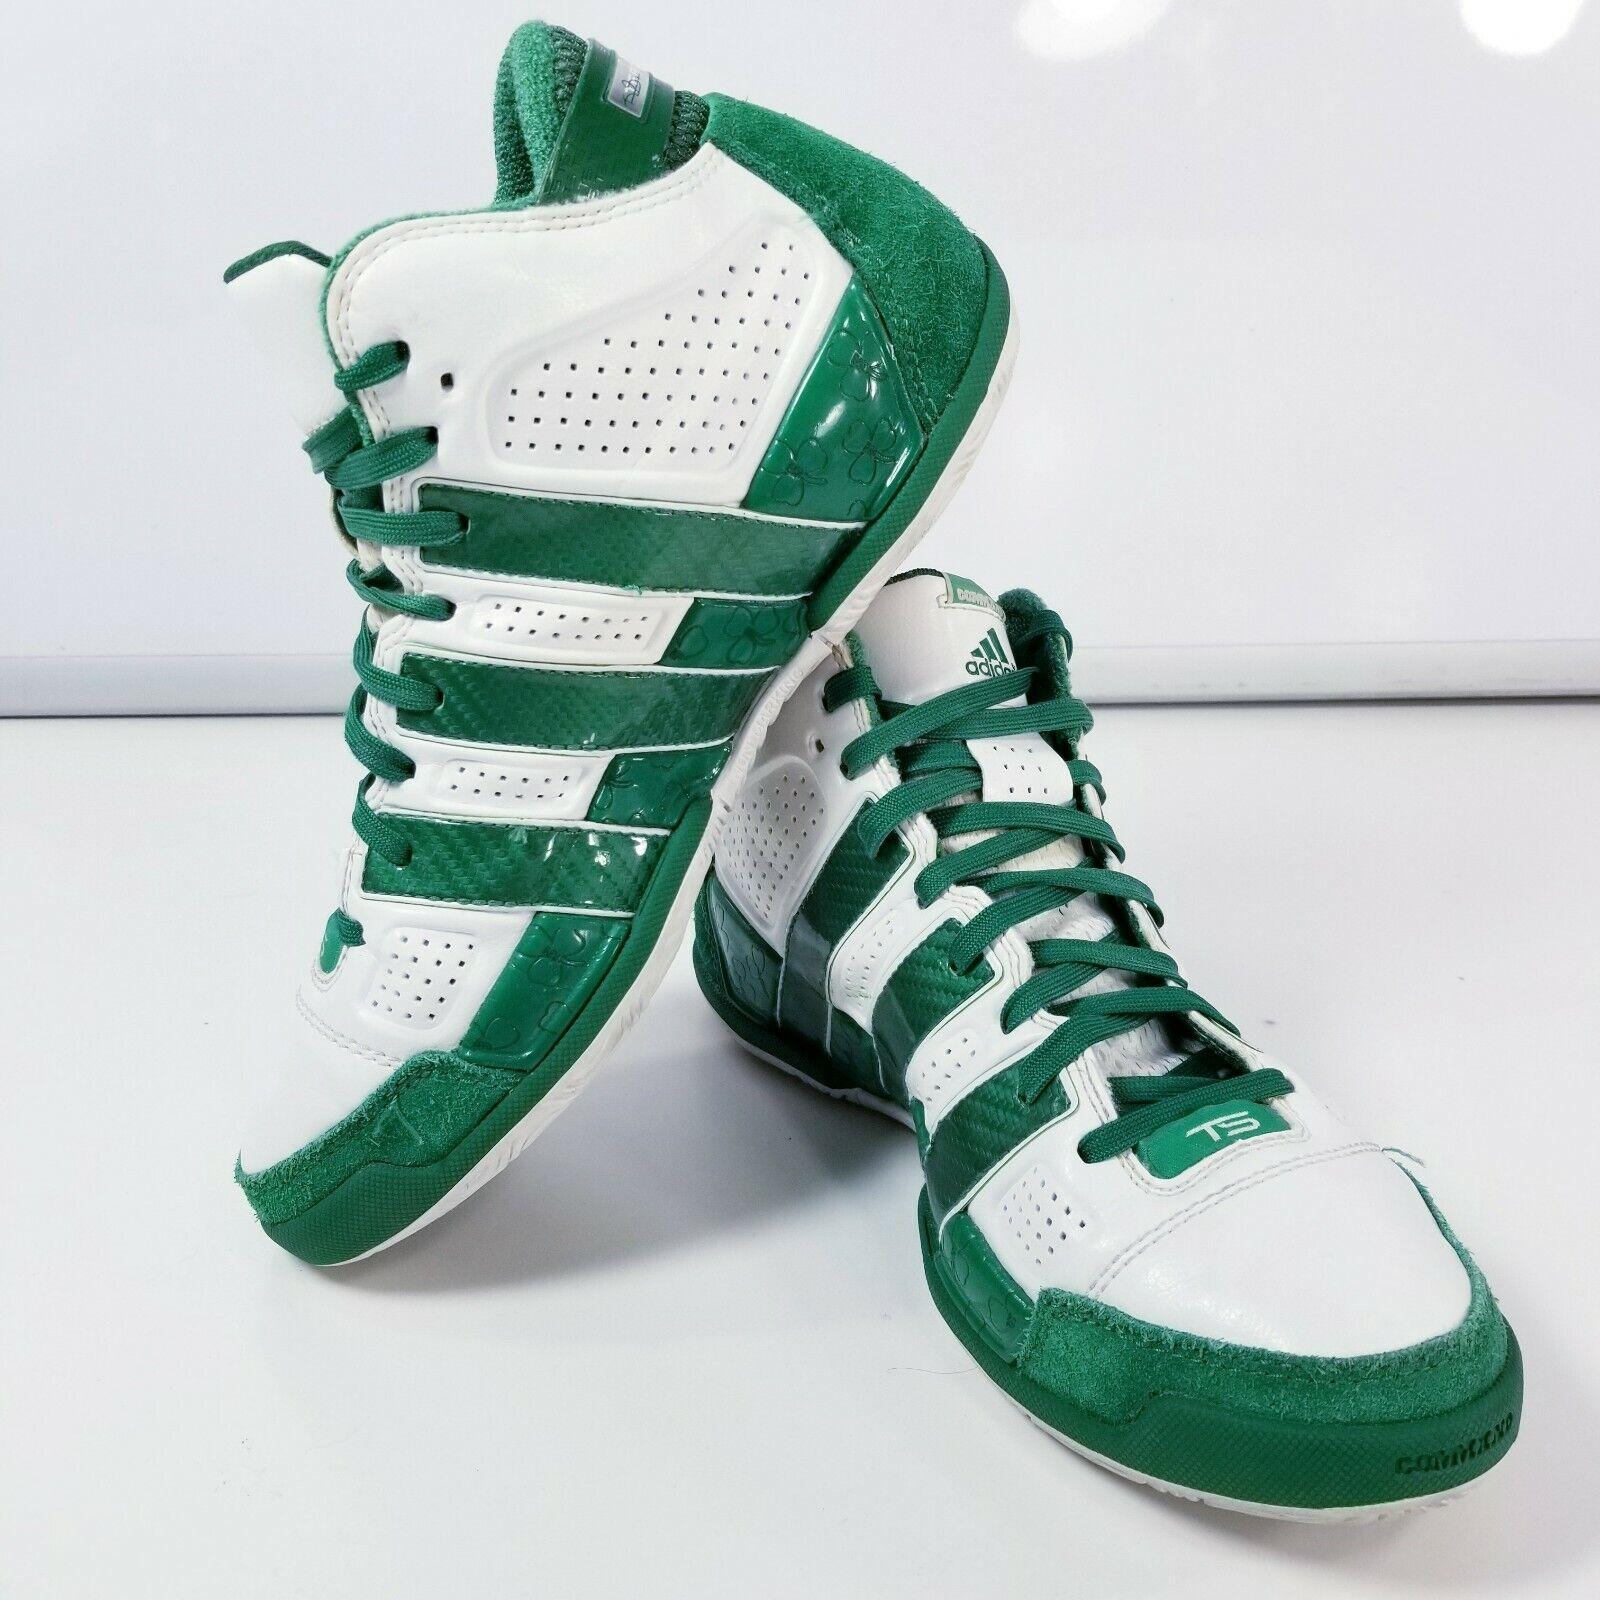 Adidas KG Garnett Team Signature TS5 T S 5 Boston Celtics Sneaker shoes 8.5 WIIT